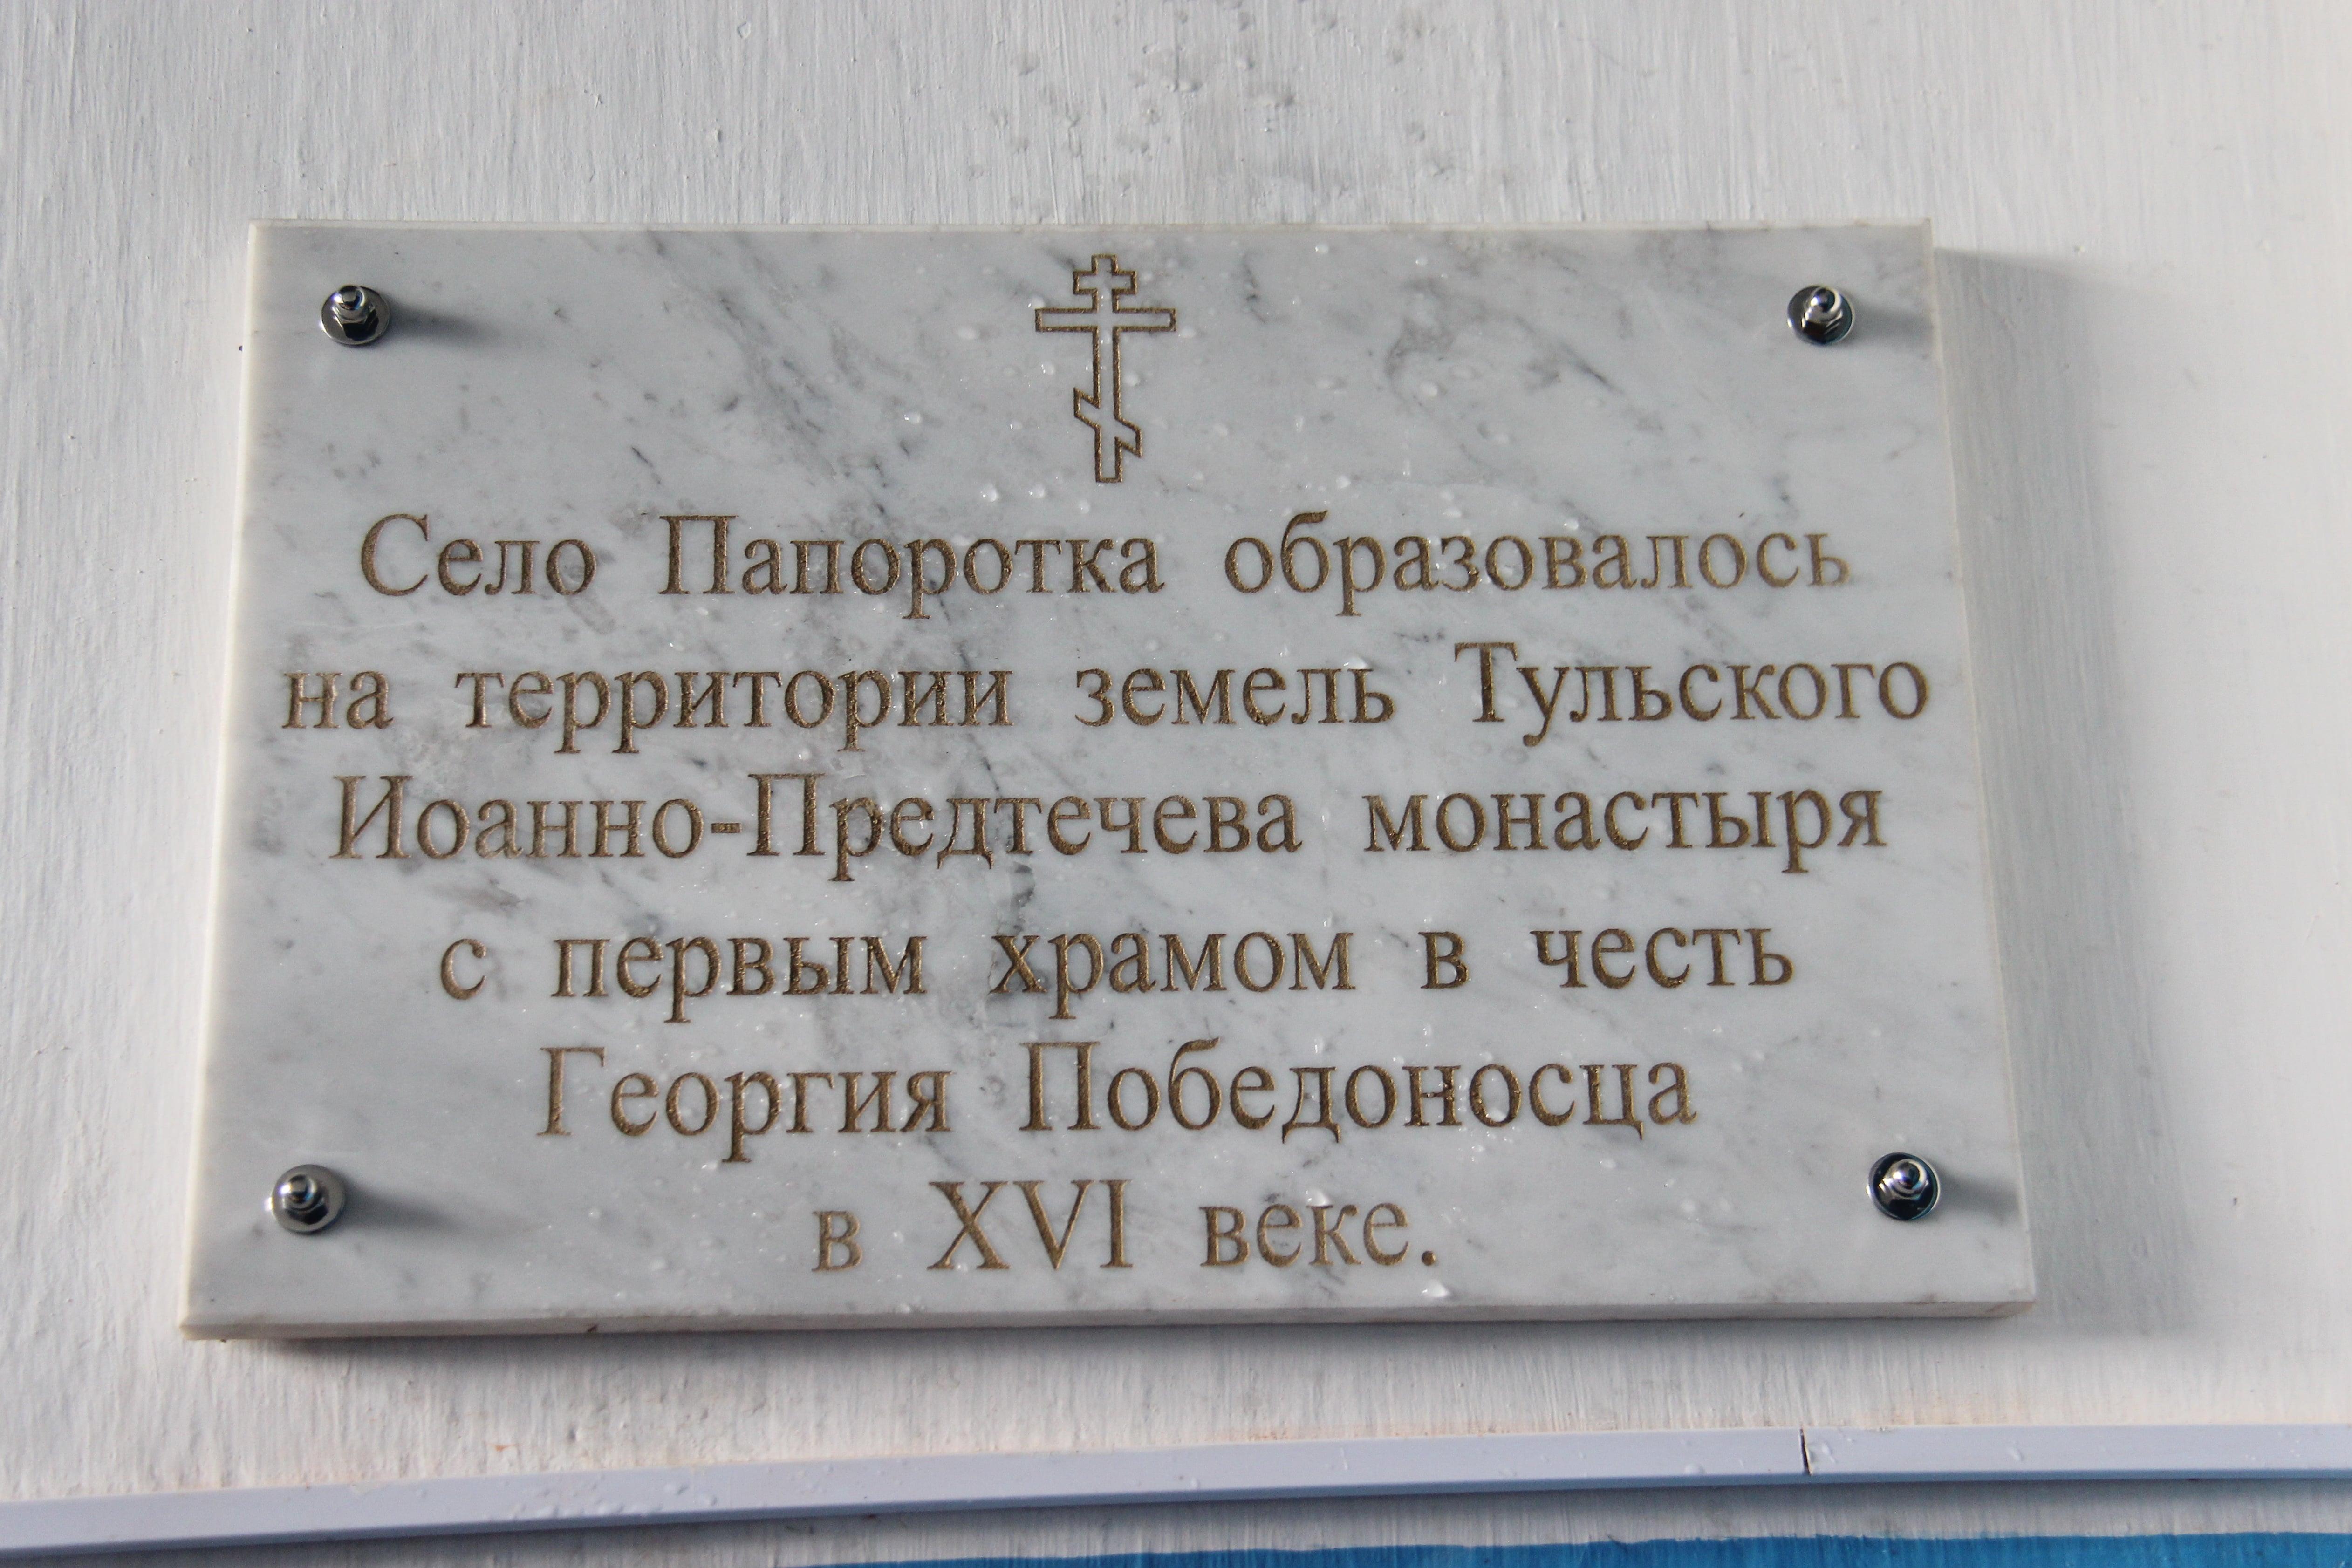 http://monuspen.ru/photoreports/761cedcebac14ed511129cb83b587d71.JPG